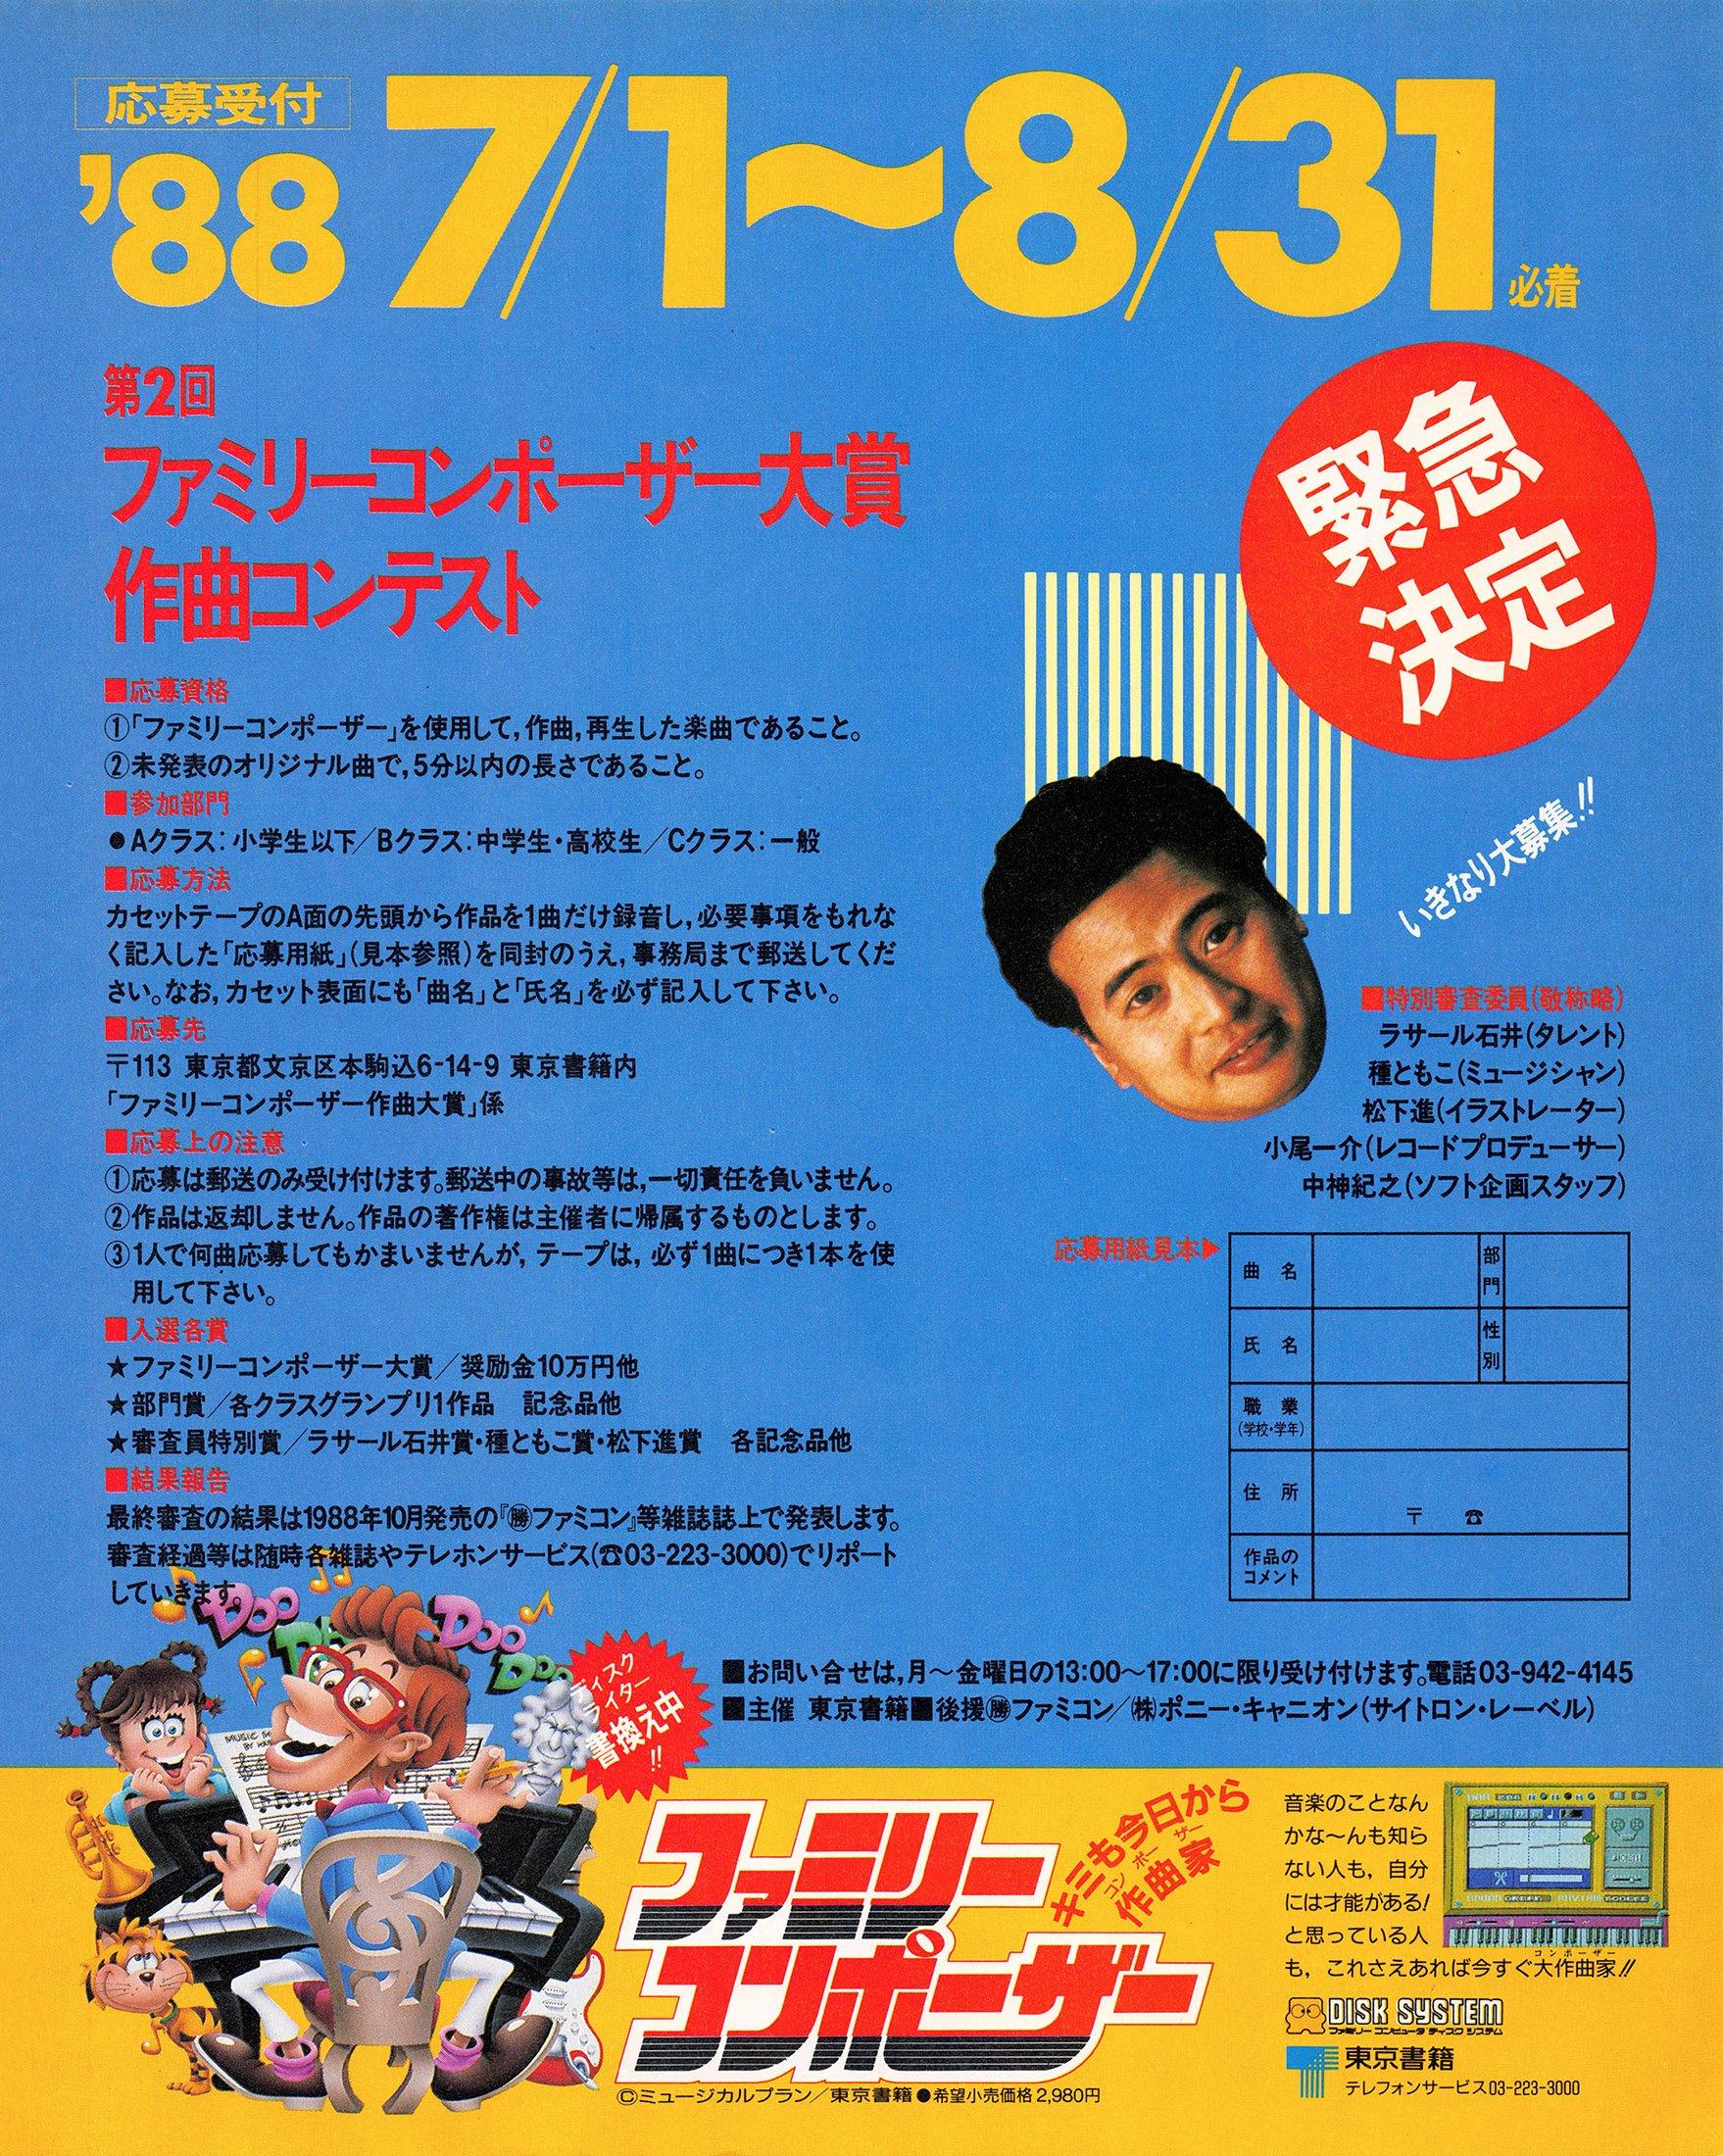 Family Composer contest (Japan)